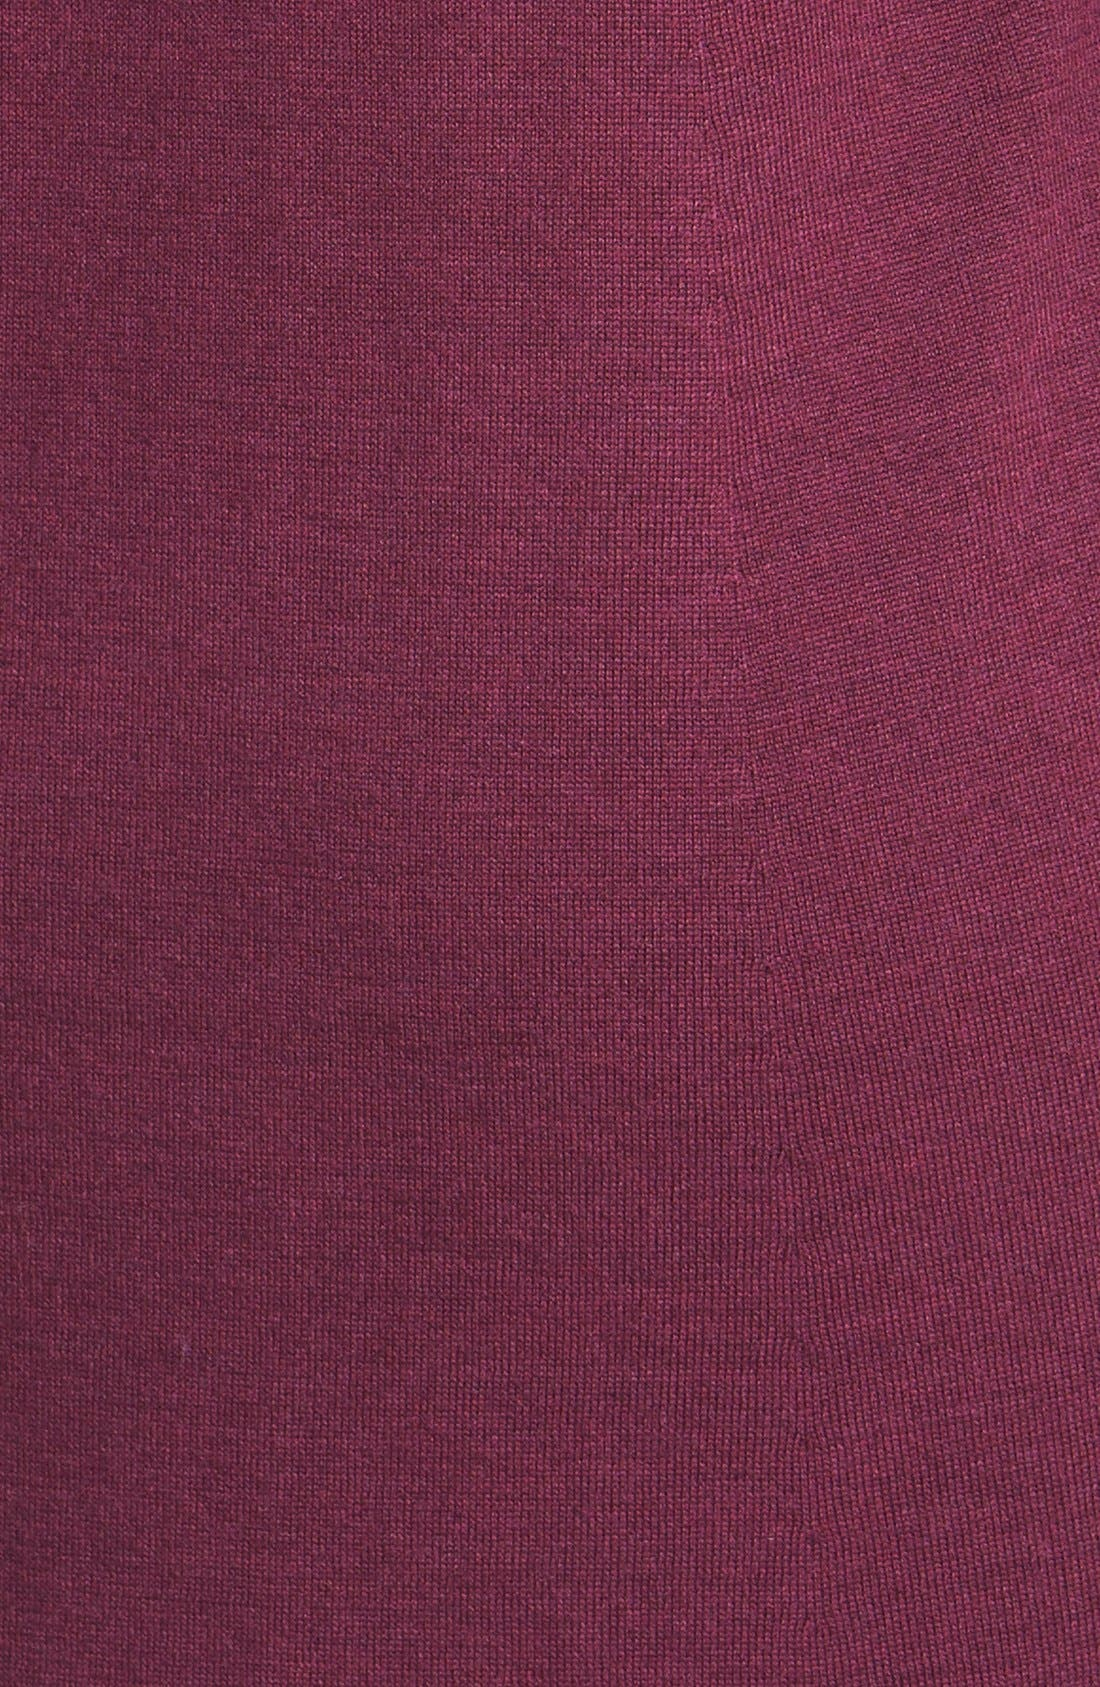 Lightweight Merino Jersey V-Neck Tunic,                             Alternate thumbnail 104, color,